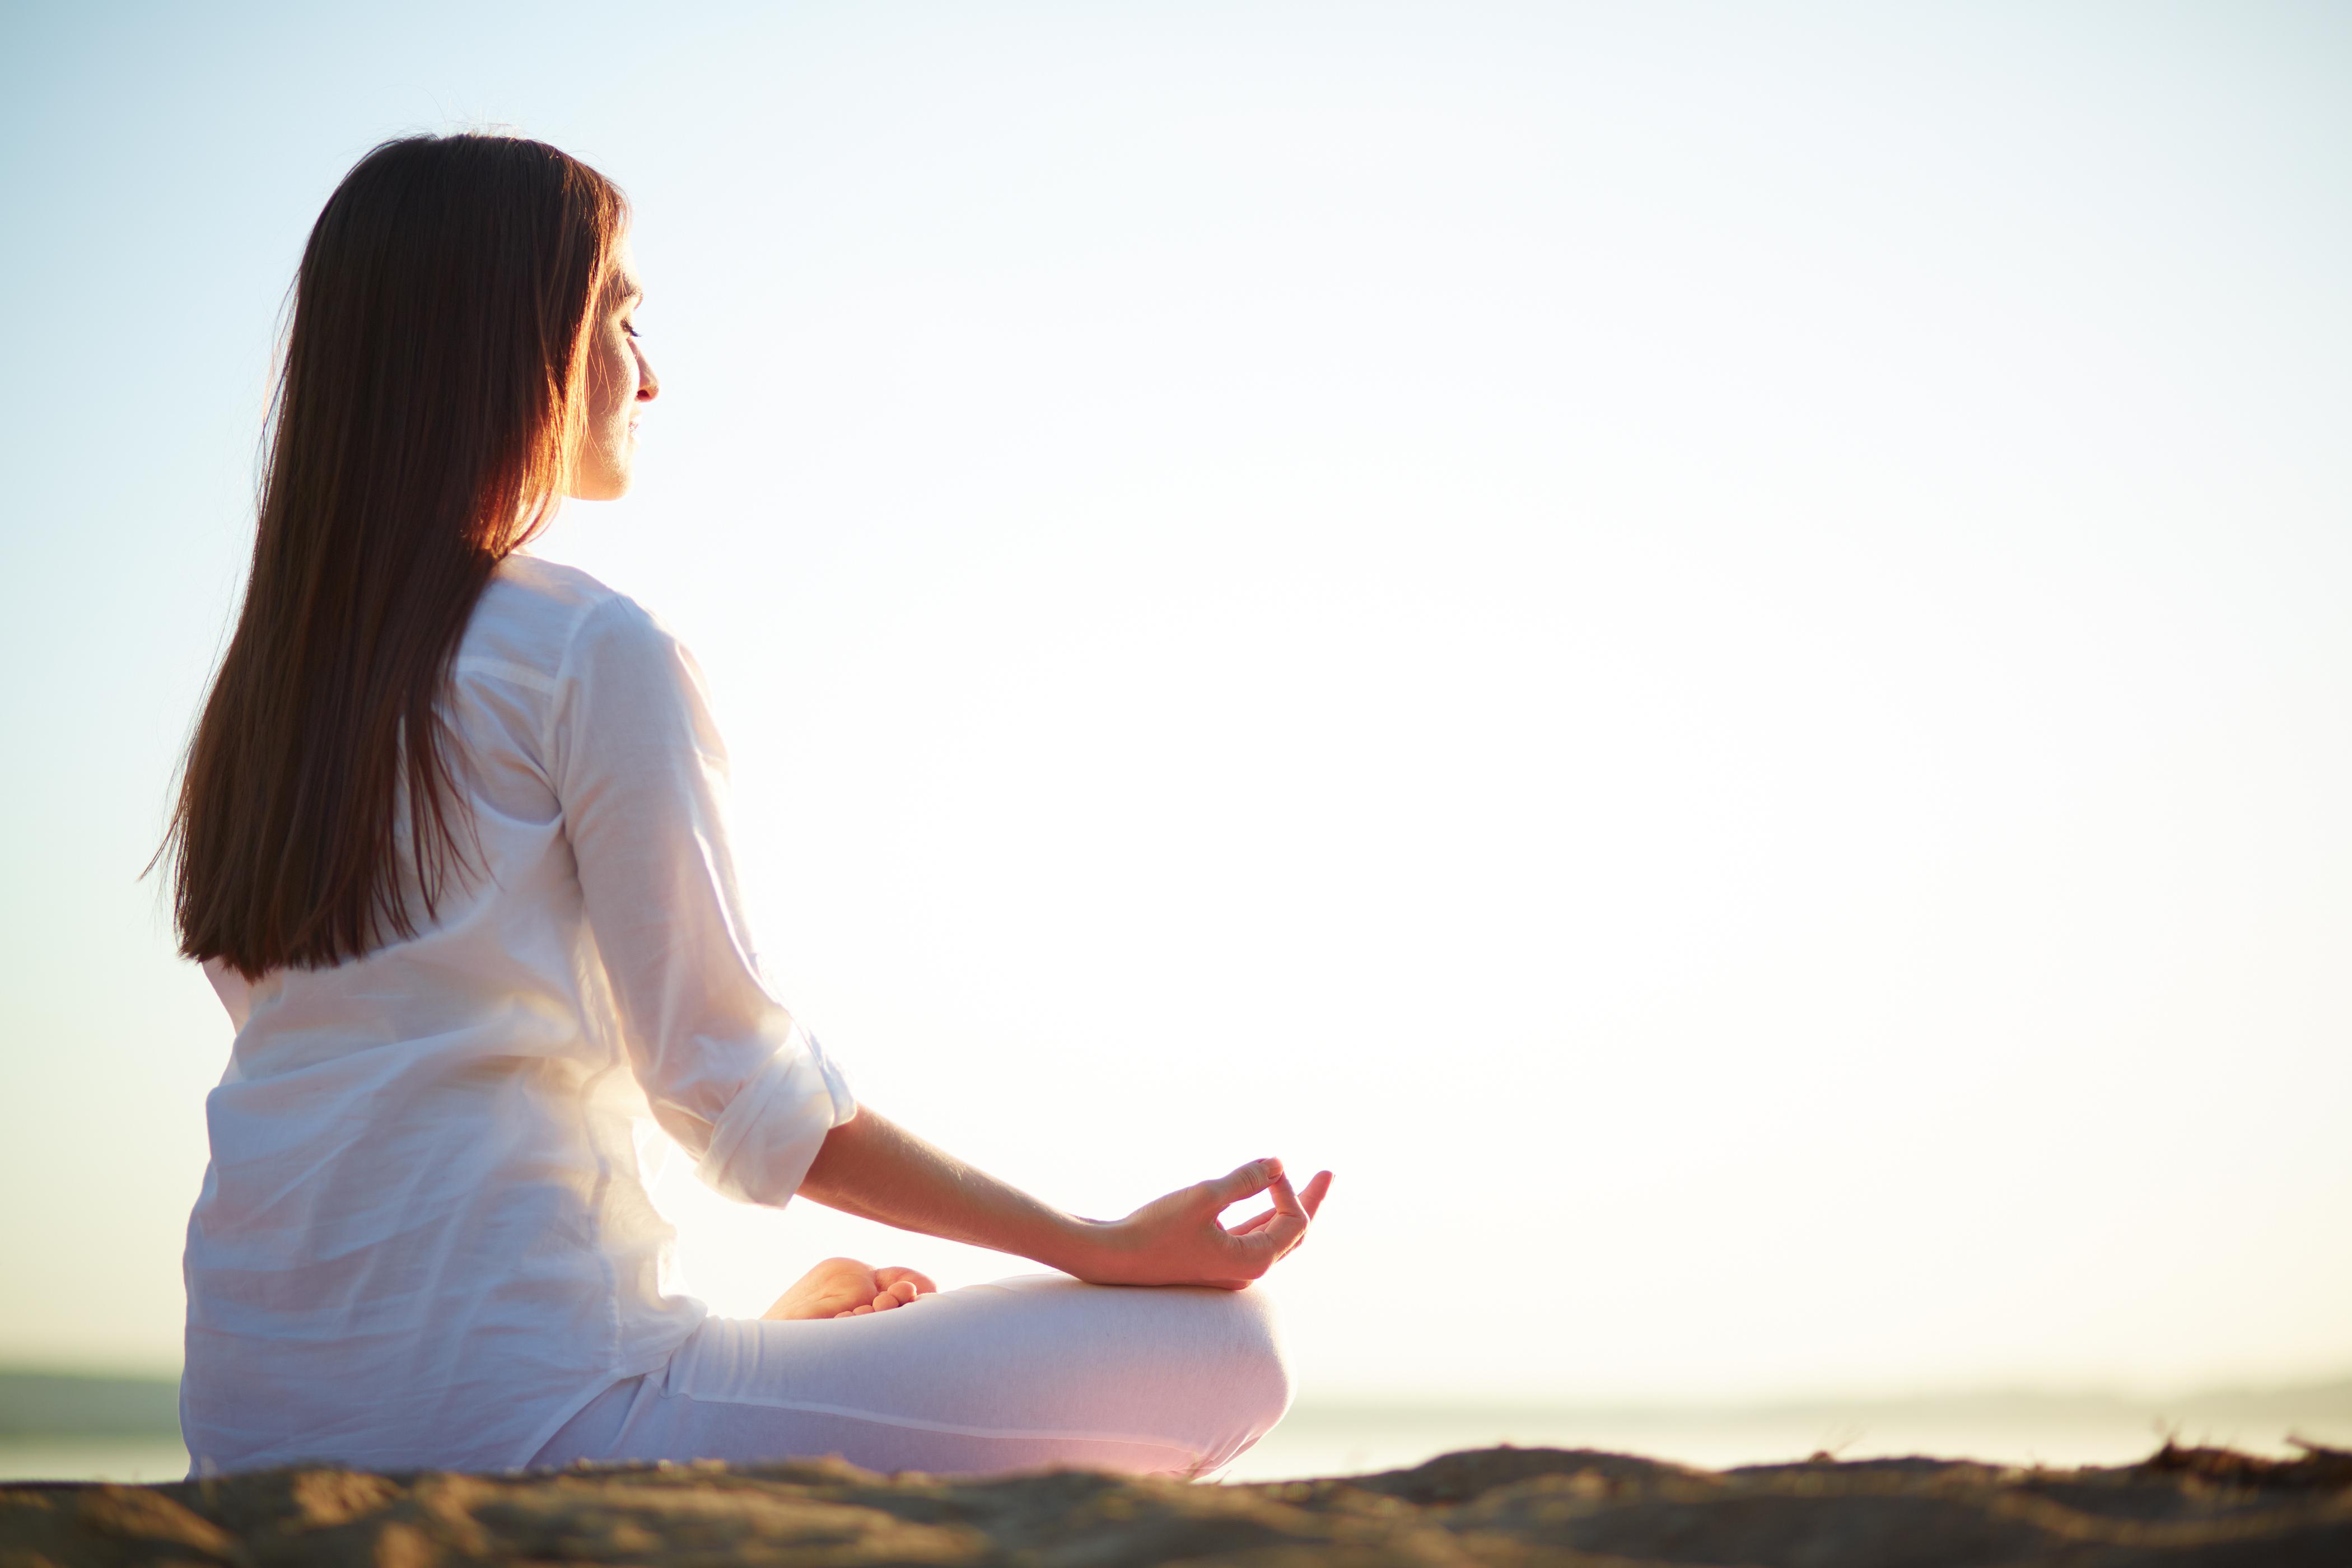 woman-sitting-yoga-pose-beach